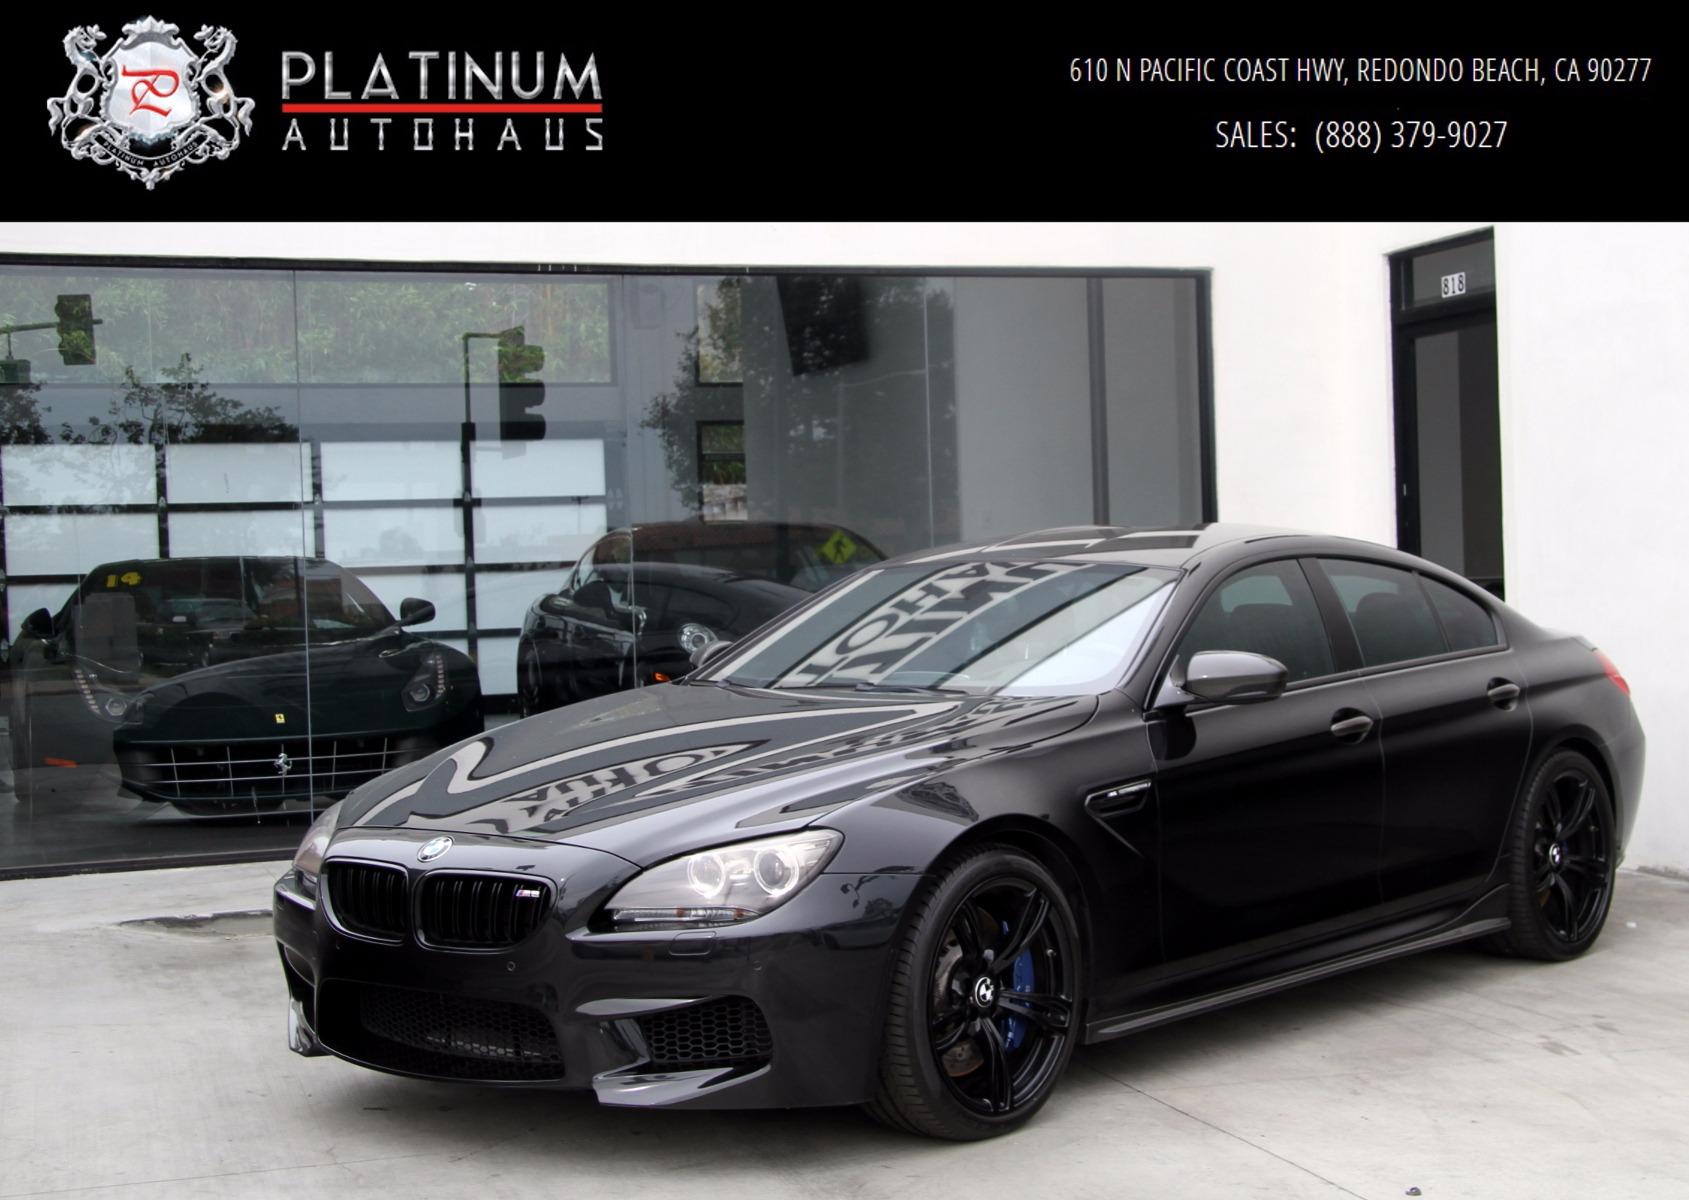 2014 Bmw M6 Gran Coupe Stock 5581 For Sale Near Redondo Beach Ca Ca Bmw Dealer